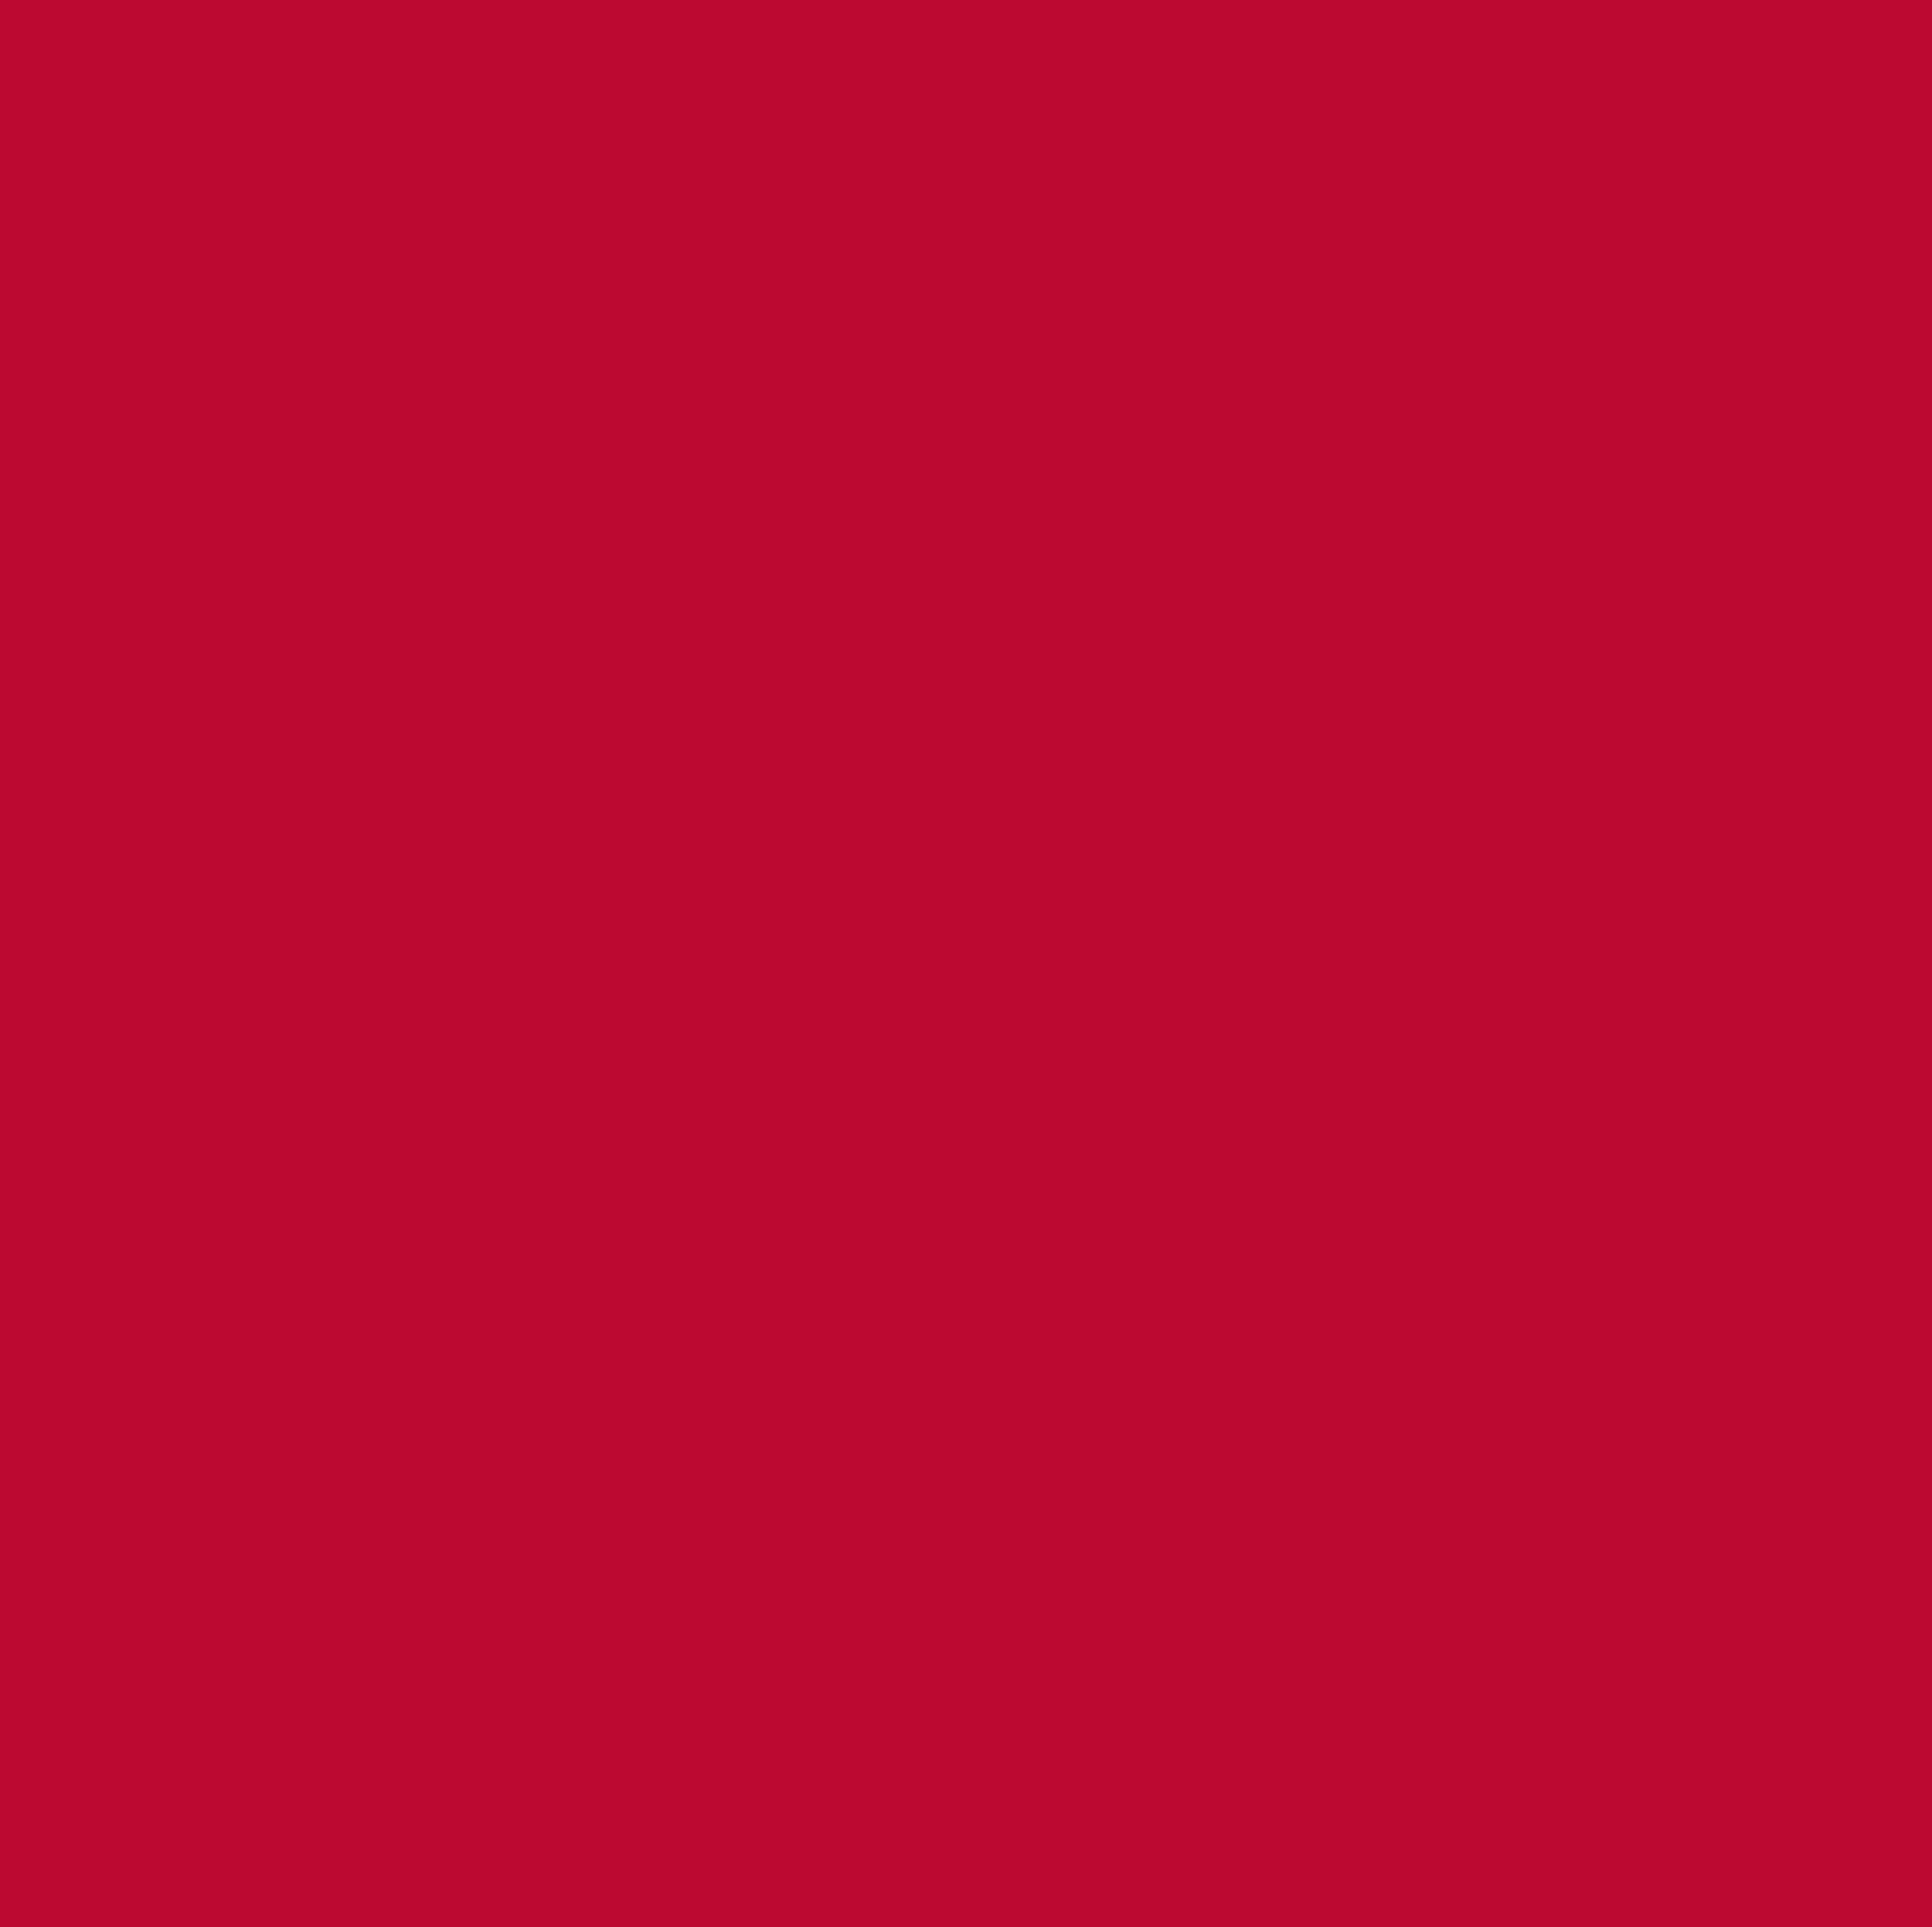 Rottöne Farbpalette basics / farben